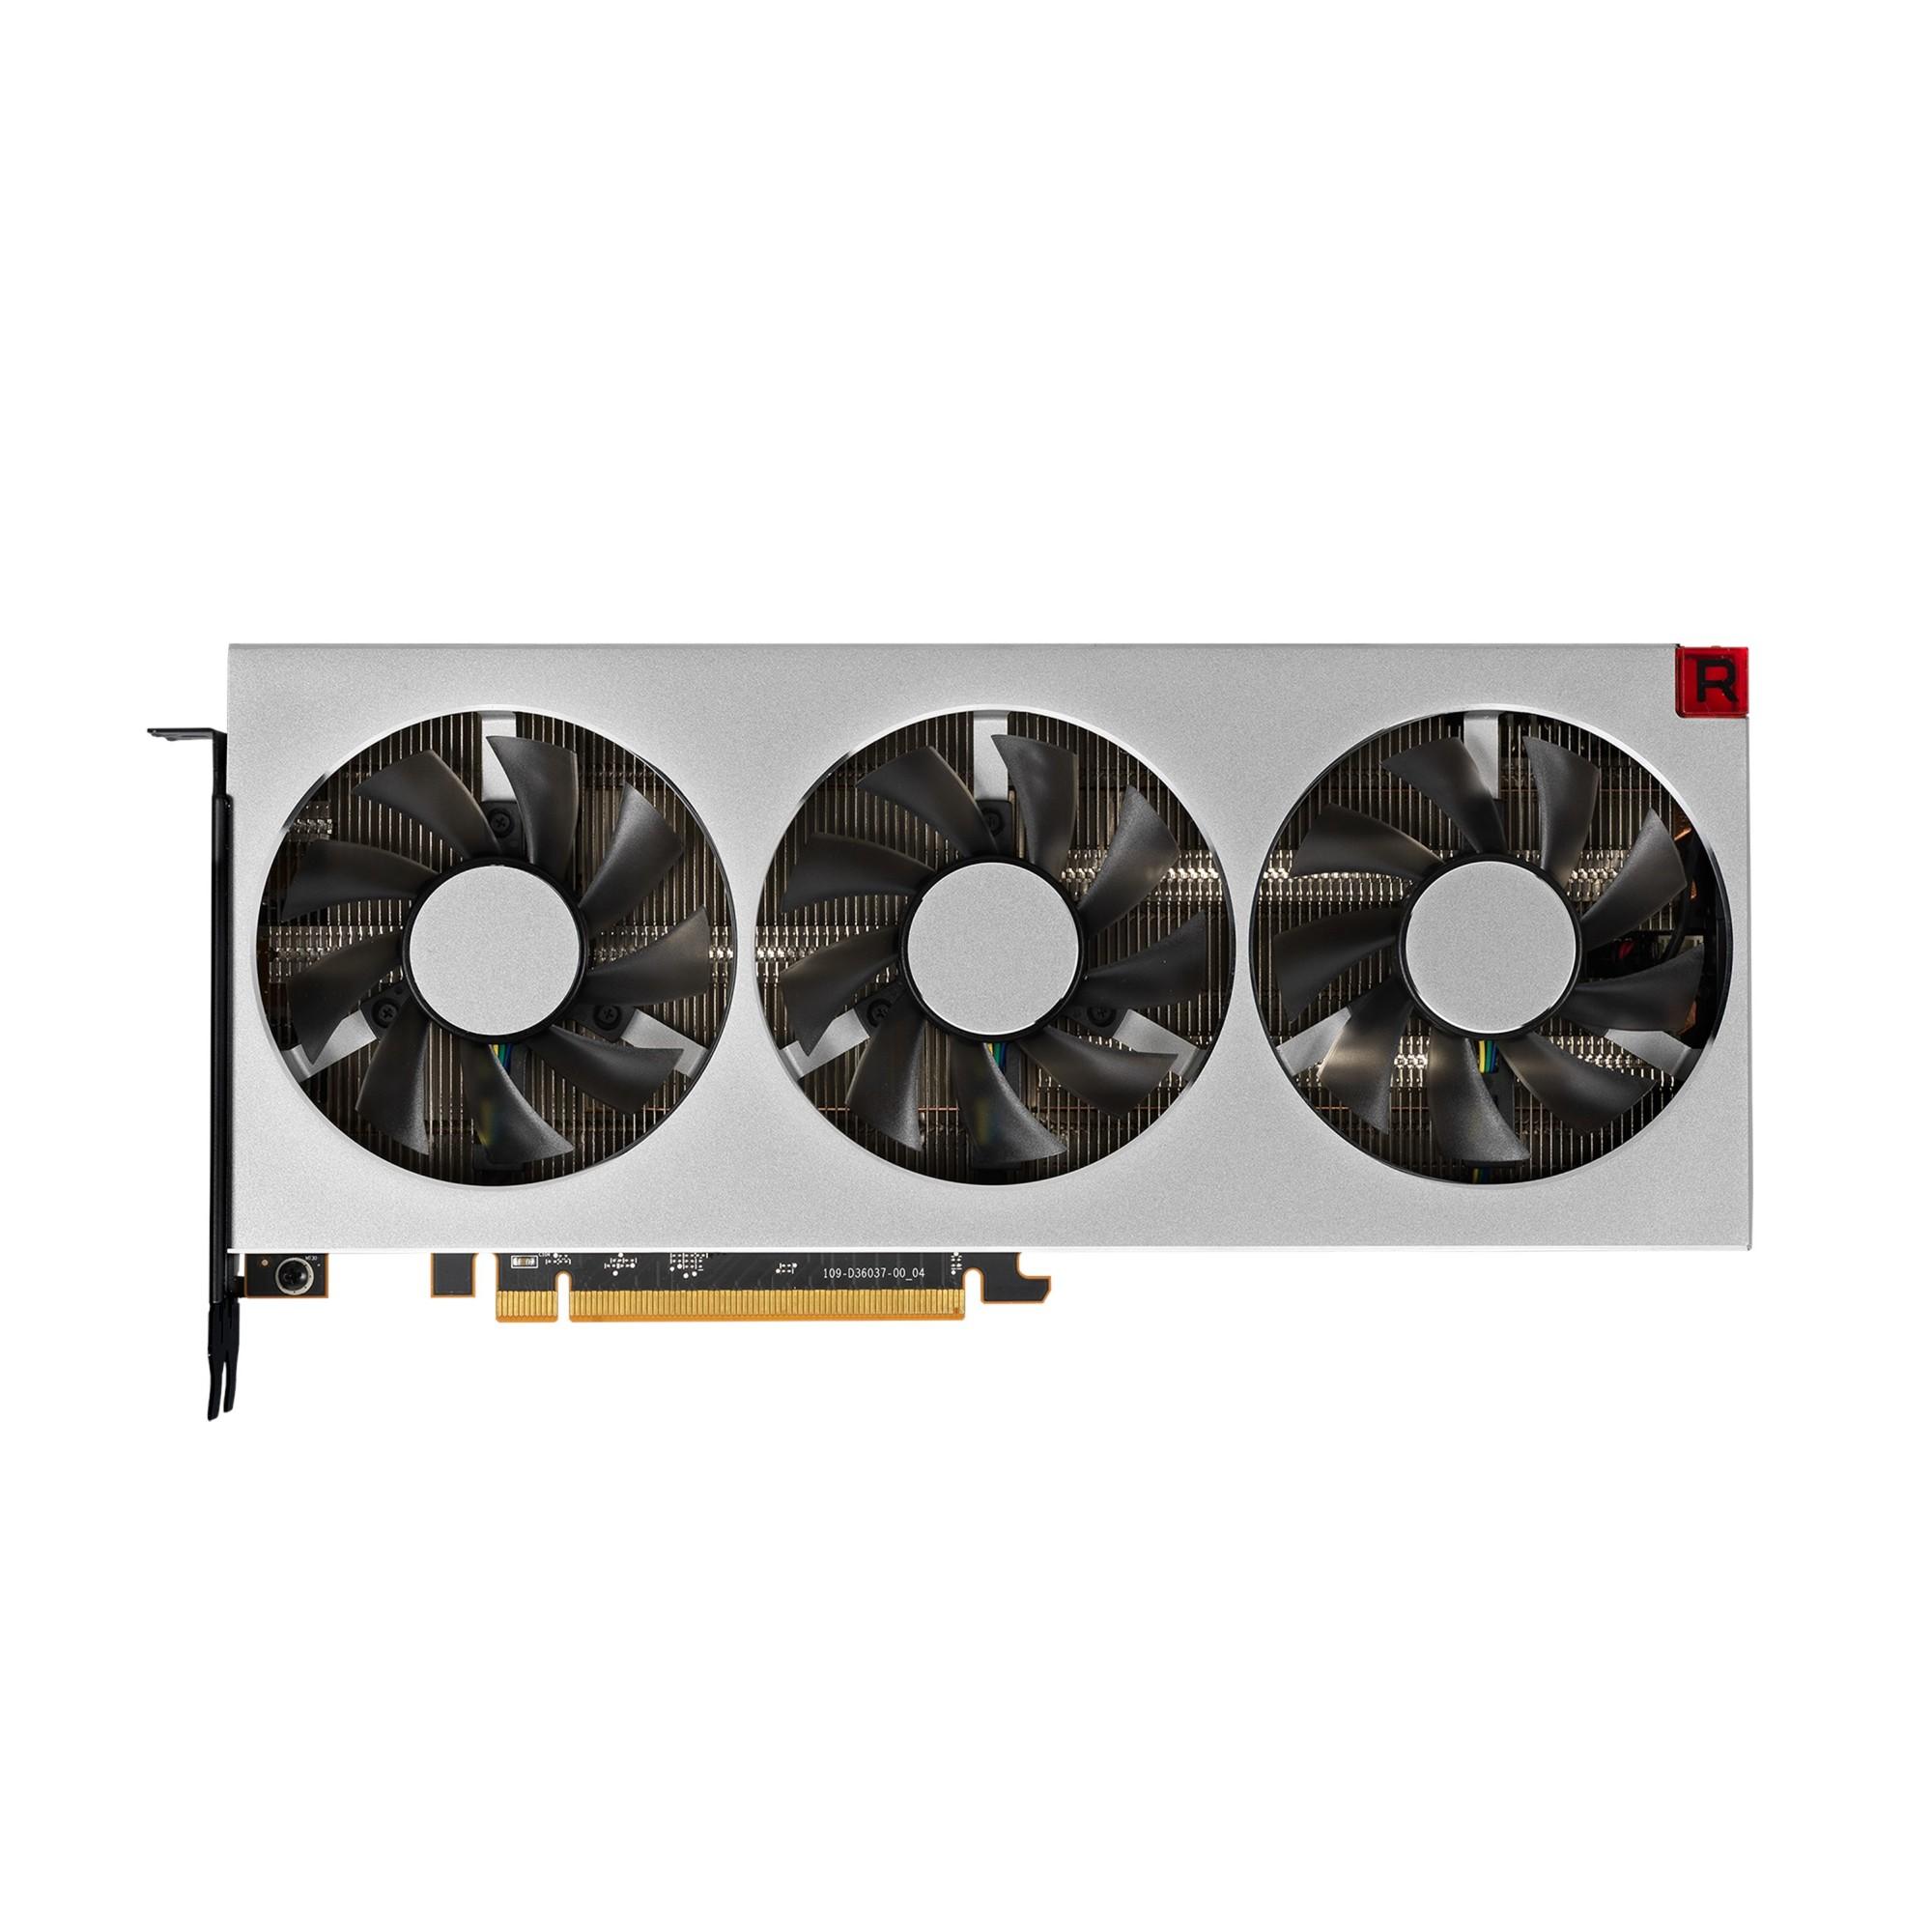 ASUS RADEONVII-16G 16 GB High Bandwidth Memory 2 (HBM2)